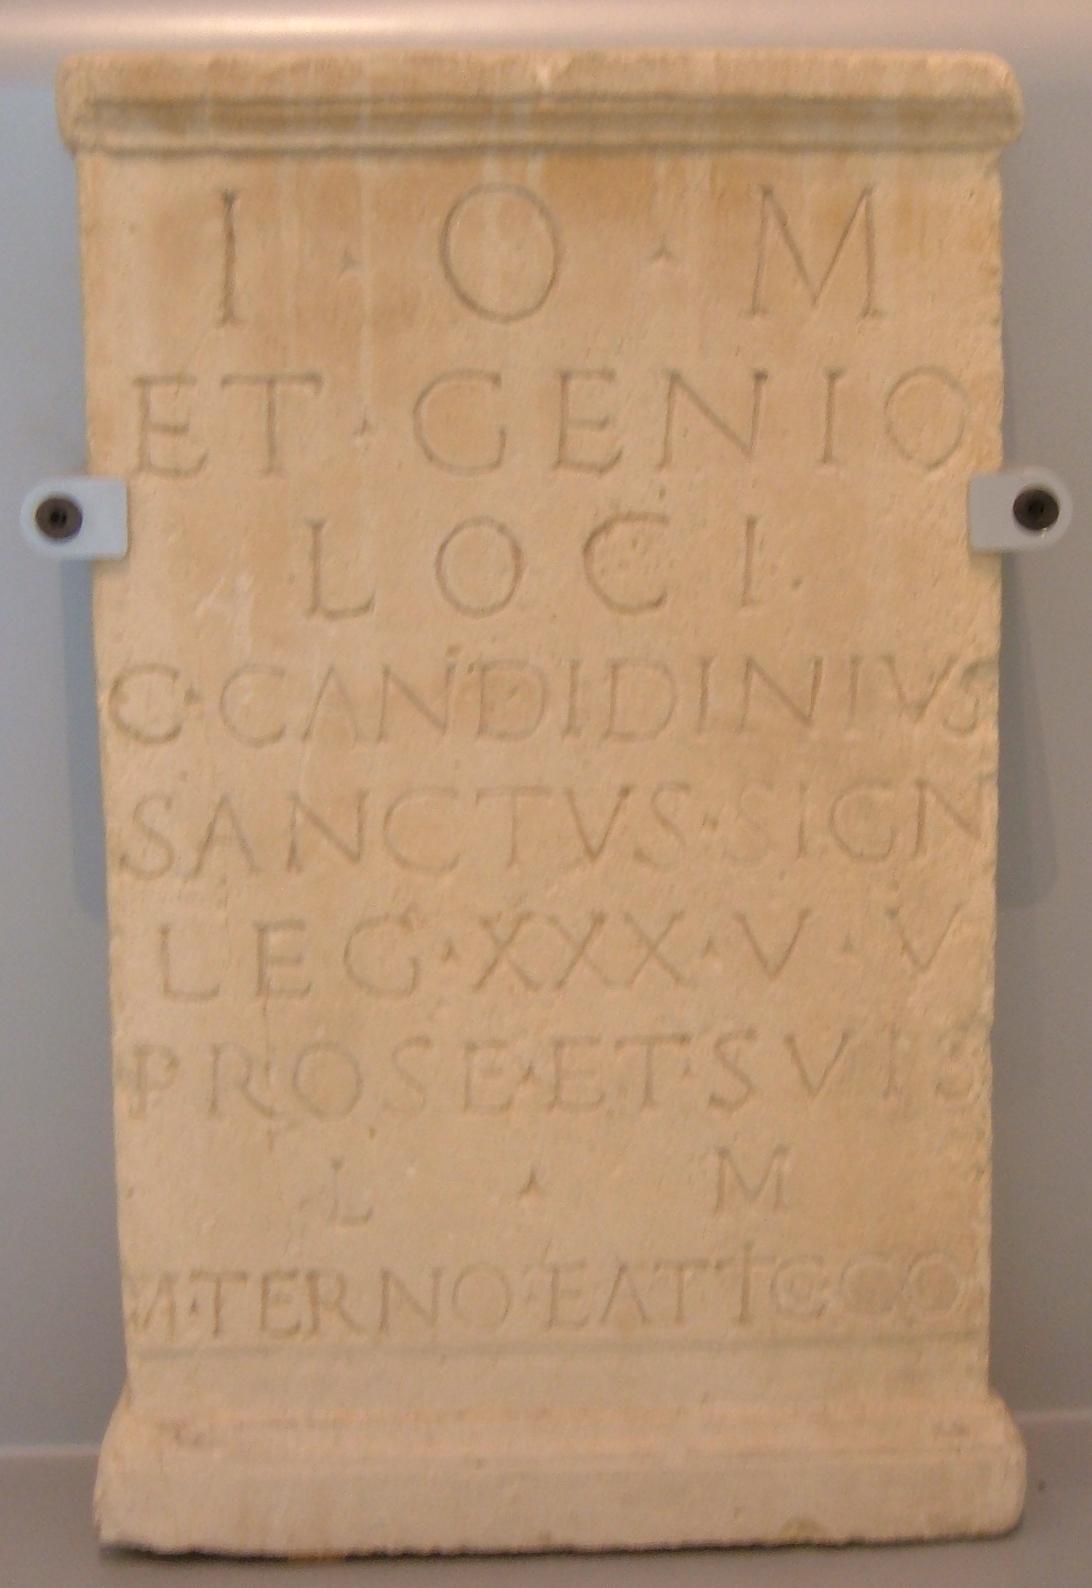 Genius loci - Wikipedia